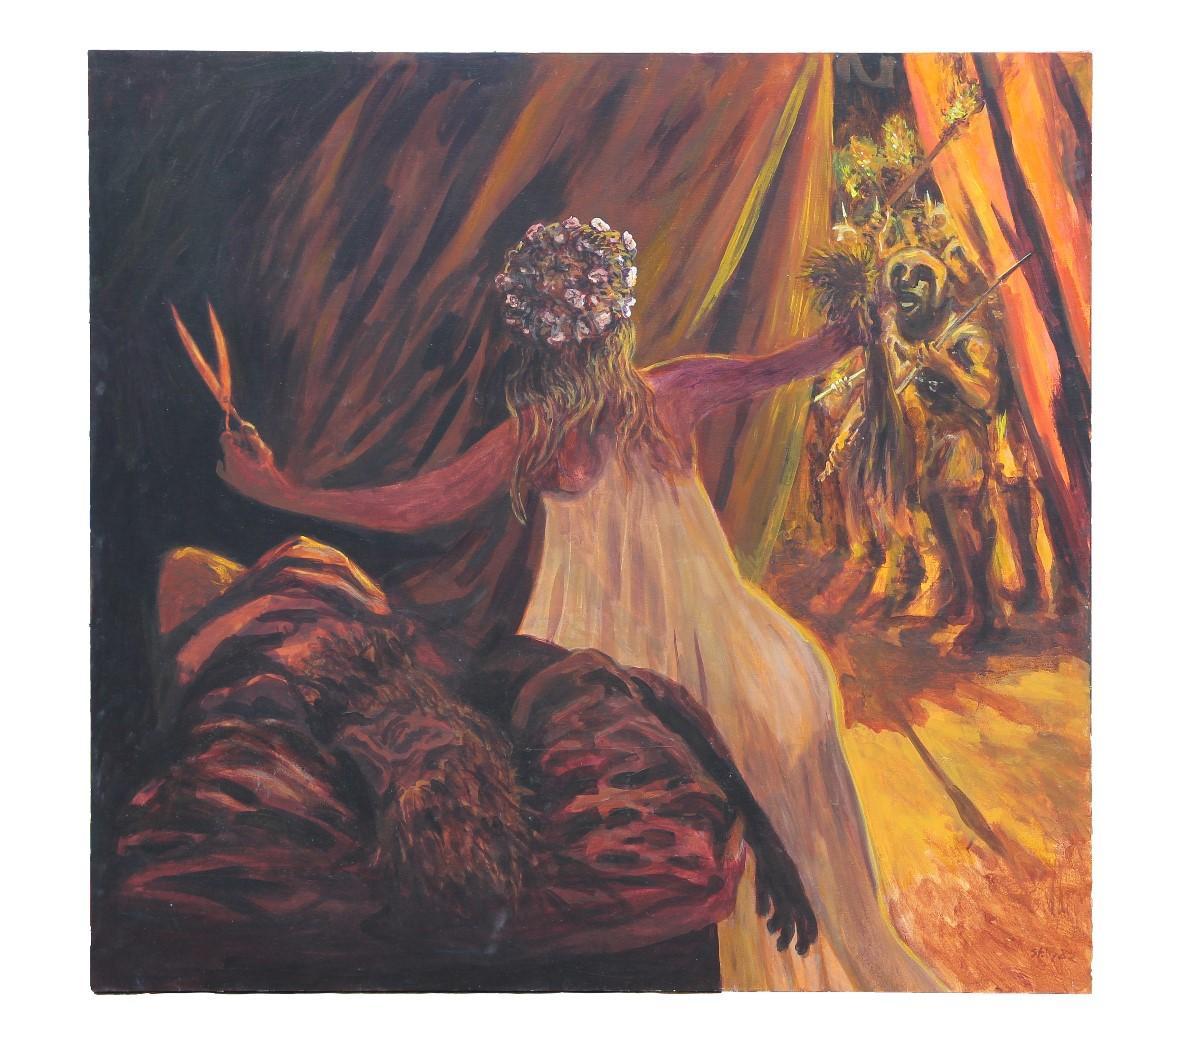 """Samson and Delilah"" Large Biblical Modern Figurative Painting"